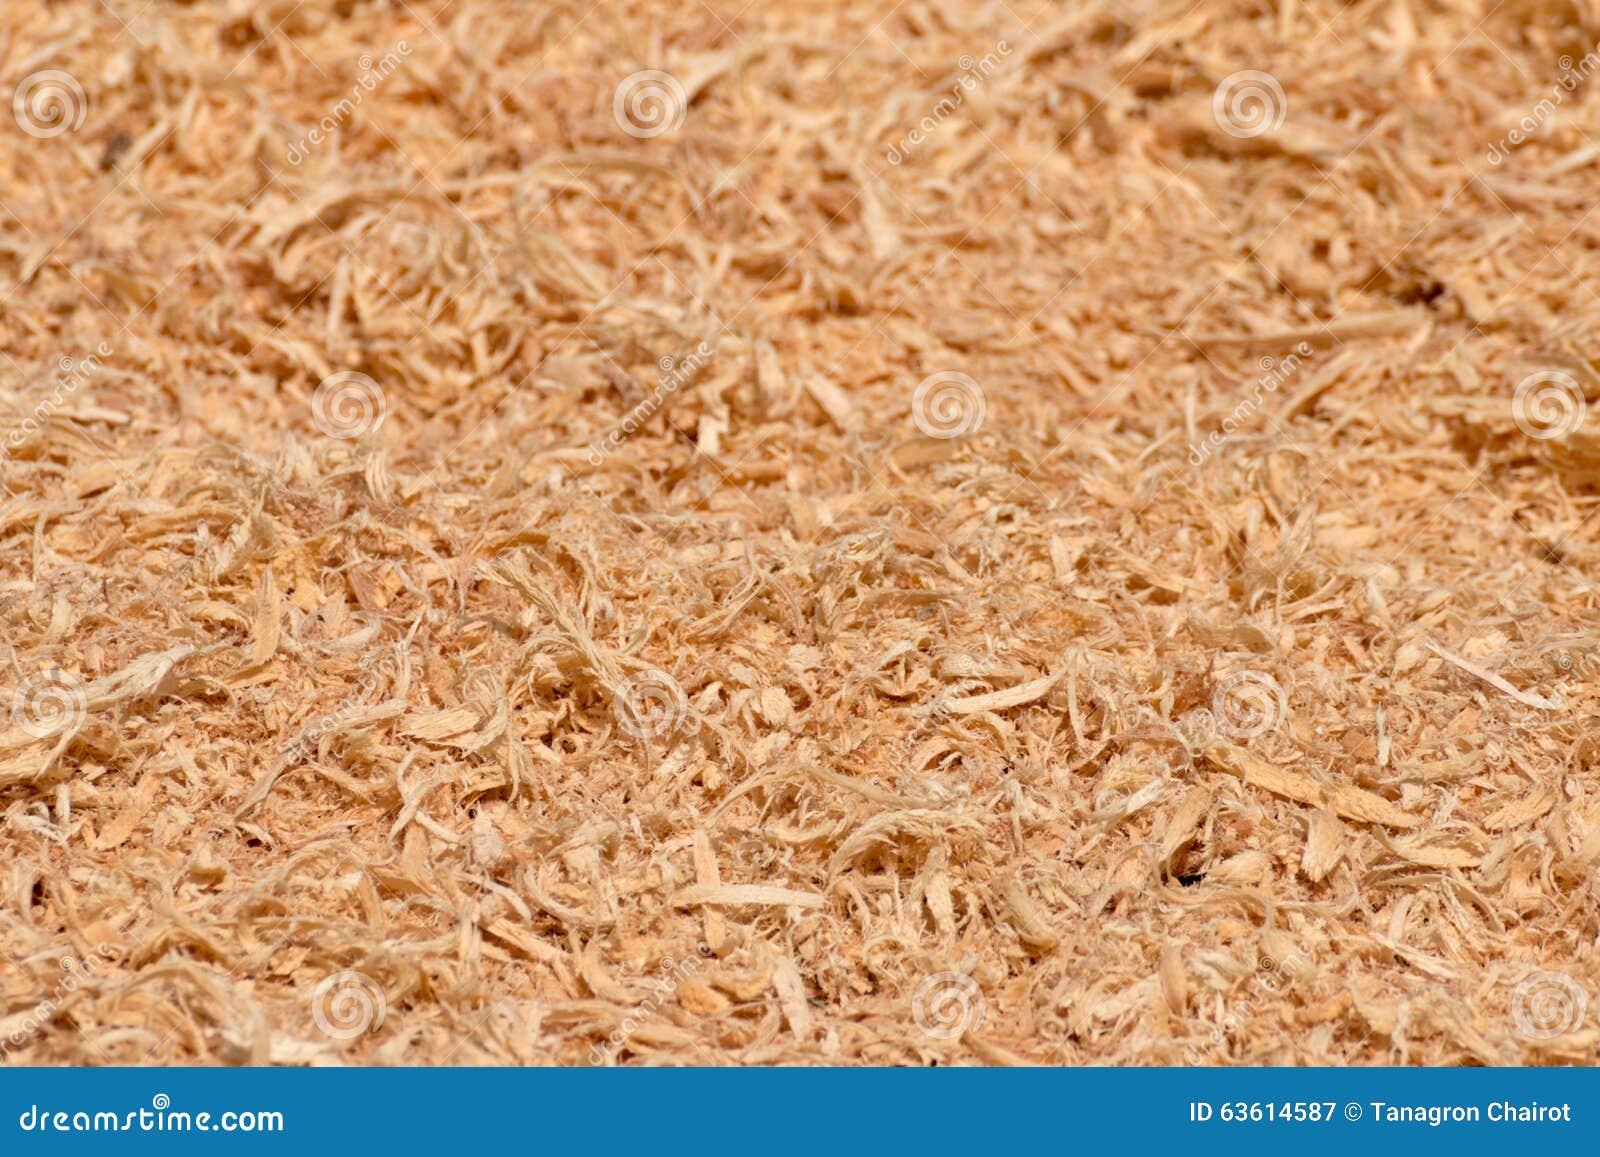 Wood Sawdust Texture Stock Photo - Image: 63614587